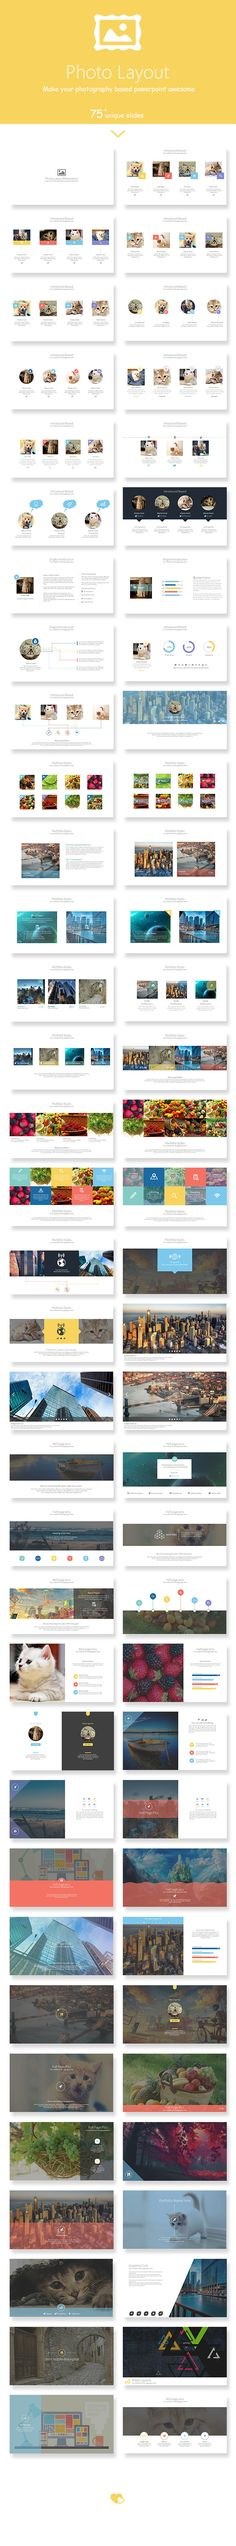 Photo Layout Powerpoint Presentation Template #design #slides Download: http://graphicriver.net/item/photo-layout-powerpoint-presentation-template/12351973?ref=ksioks